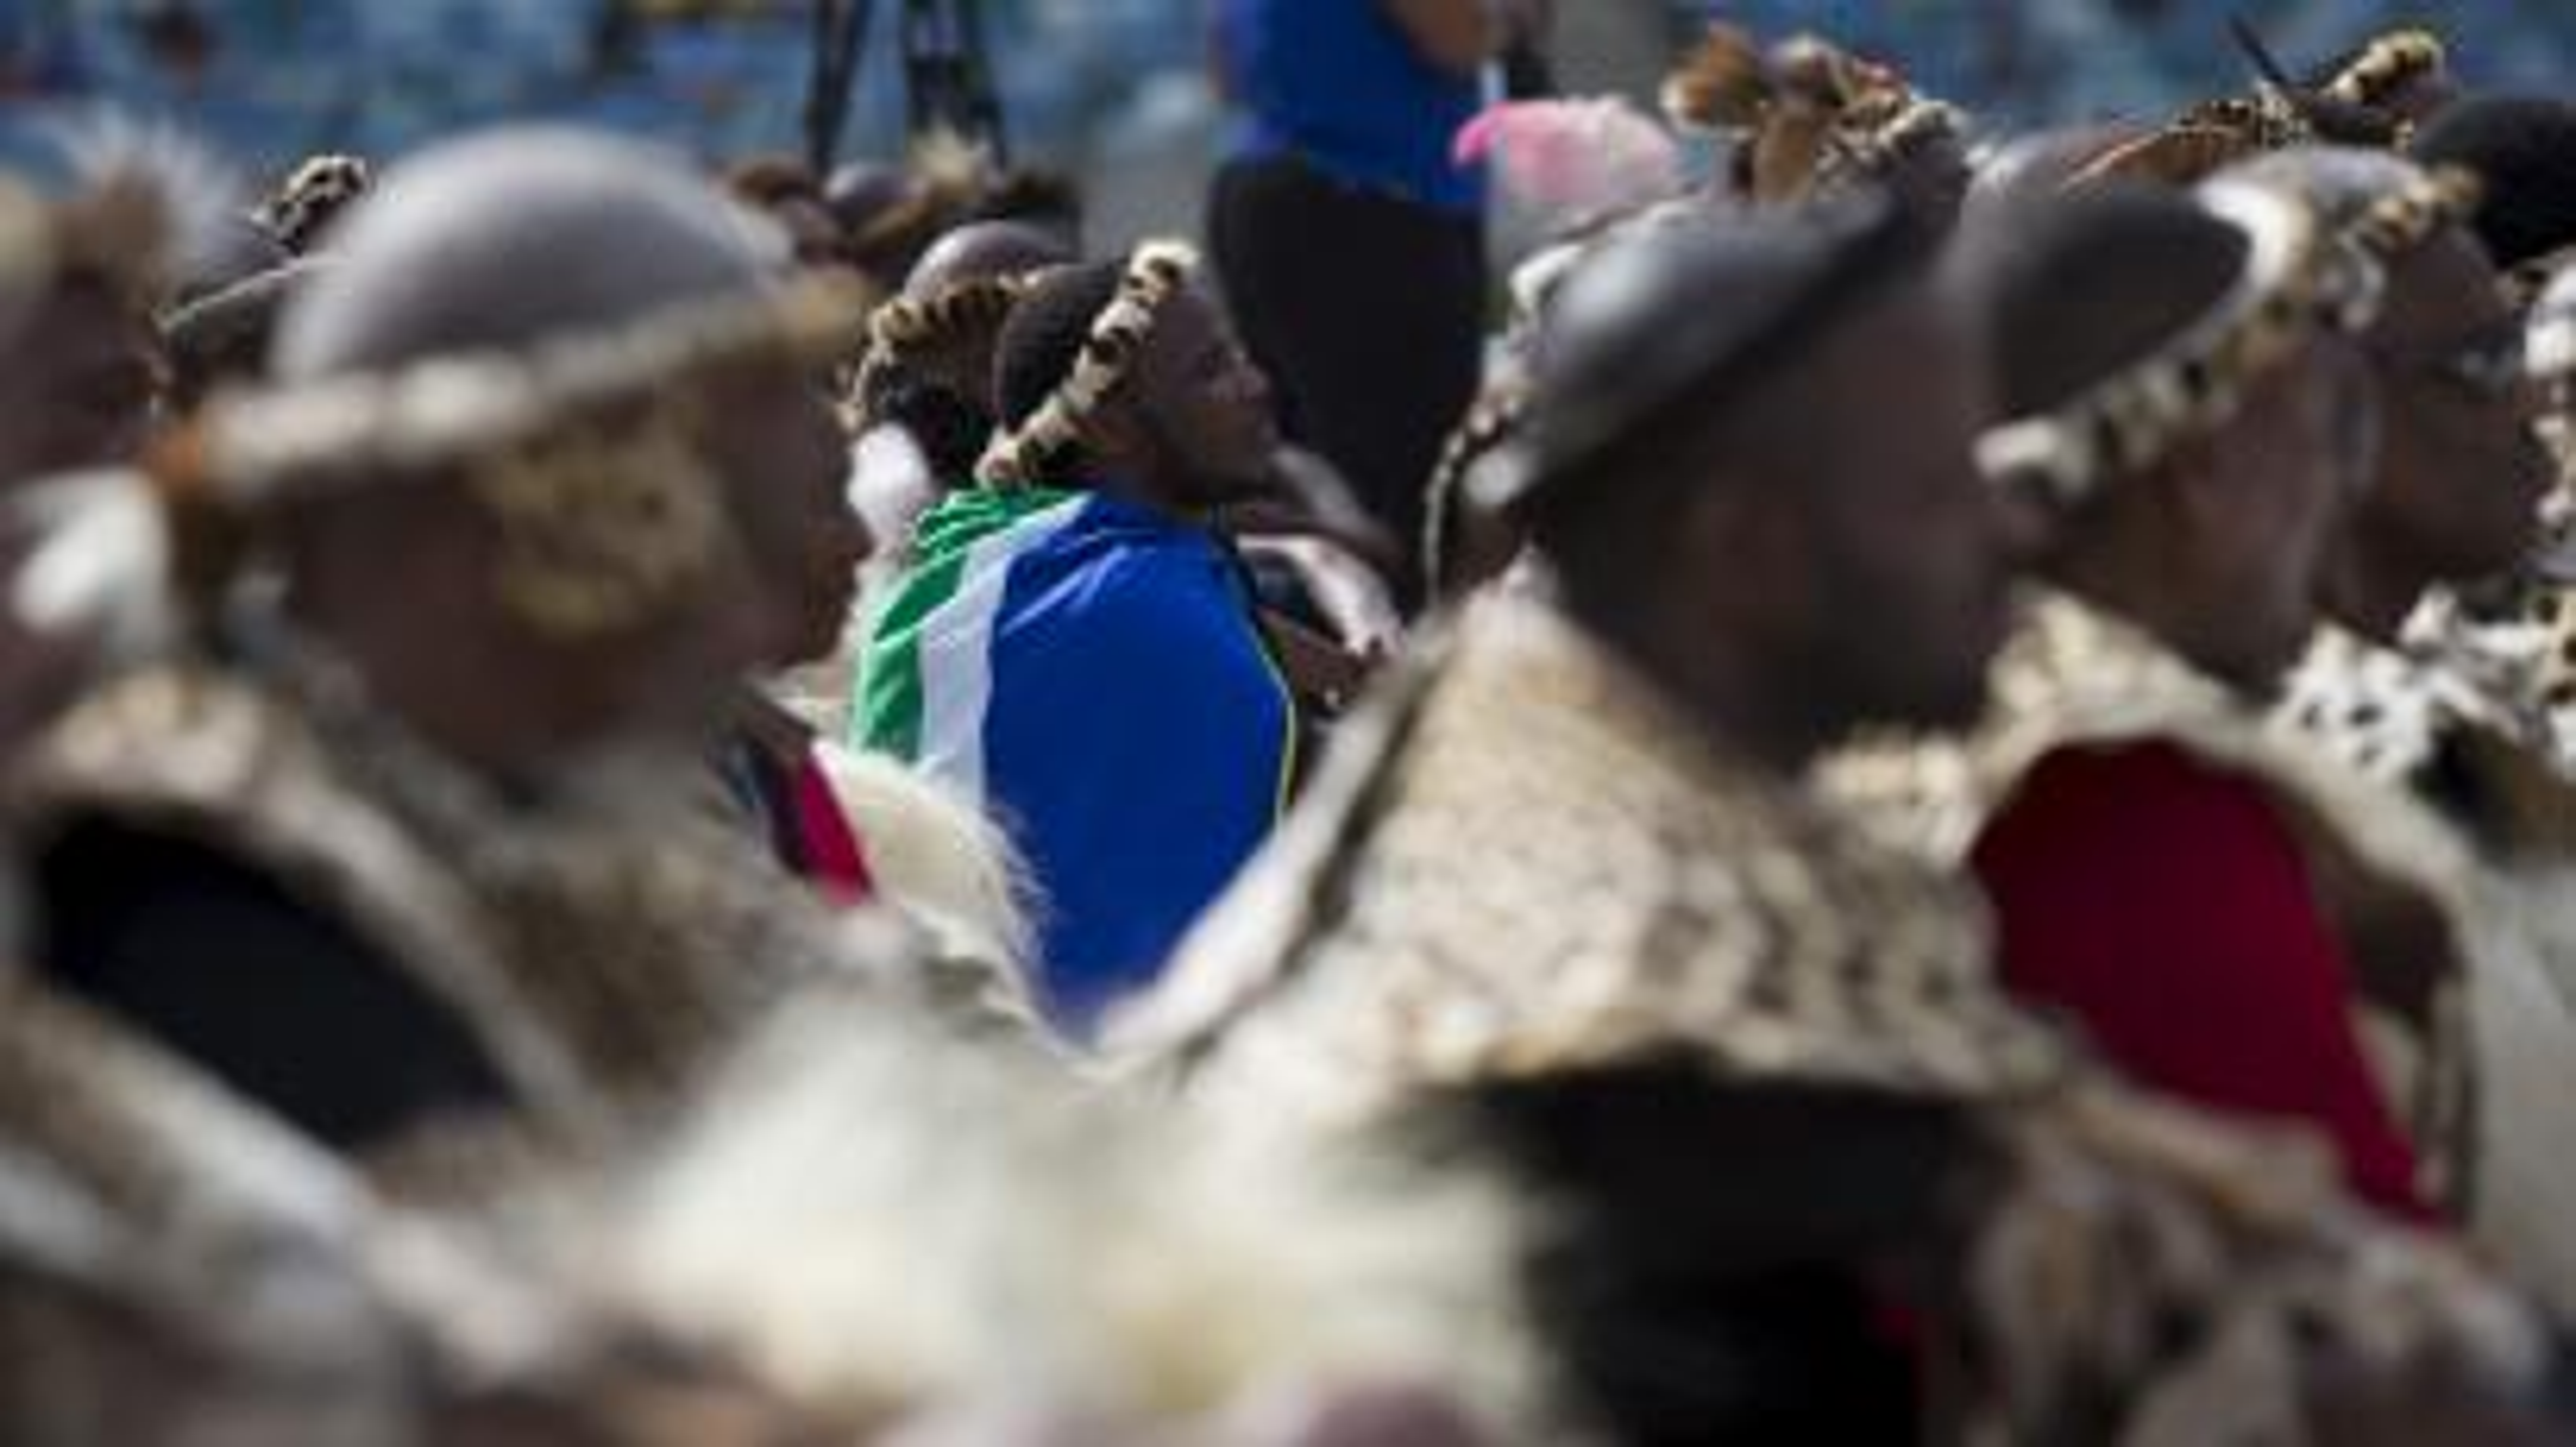 A Zulu elder wearing a South African flag listens to Zulu King Goodwill Zwelithini speak in Durban in 2015.